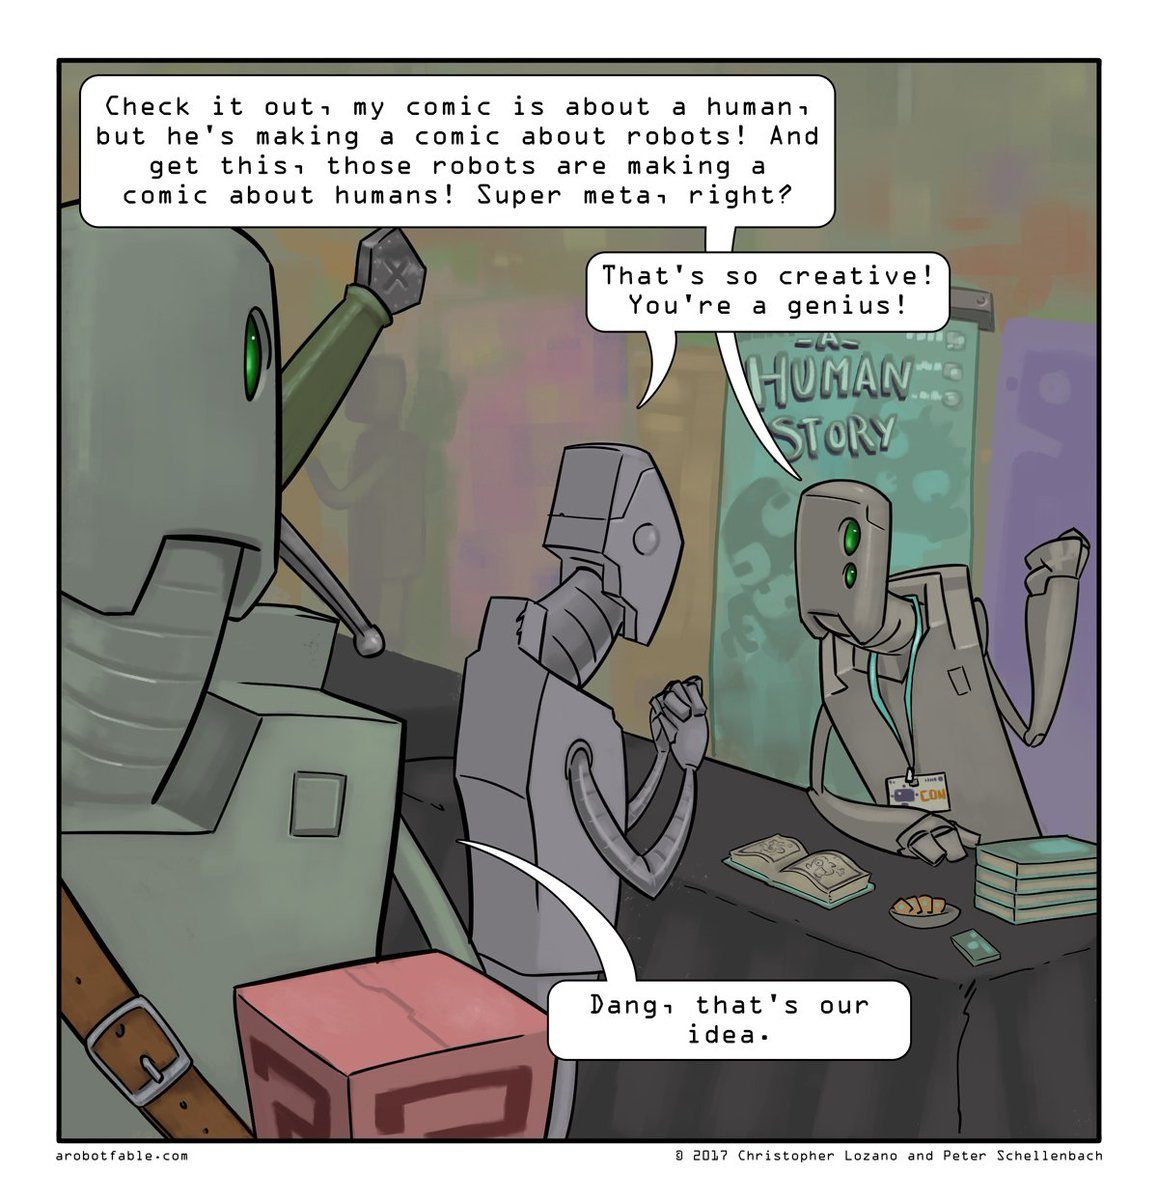 A Human Fable - 21 #robots #webcomic #comics #comicconvention #stolemyidea